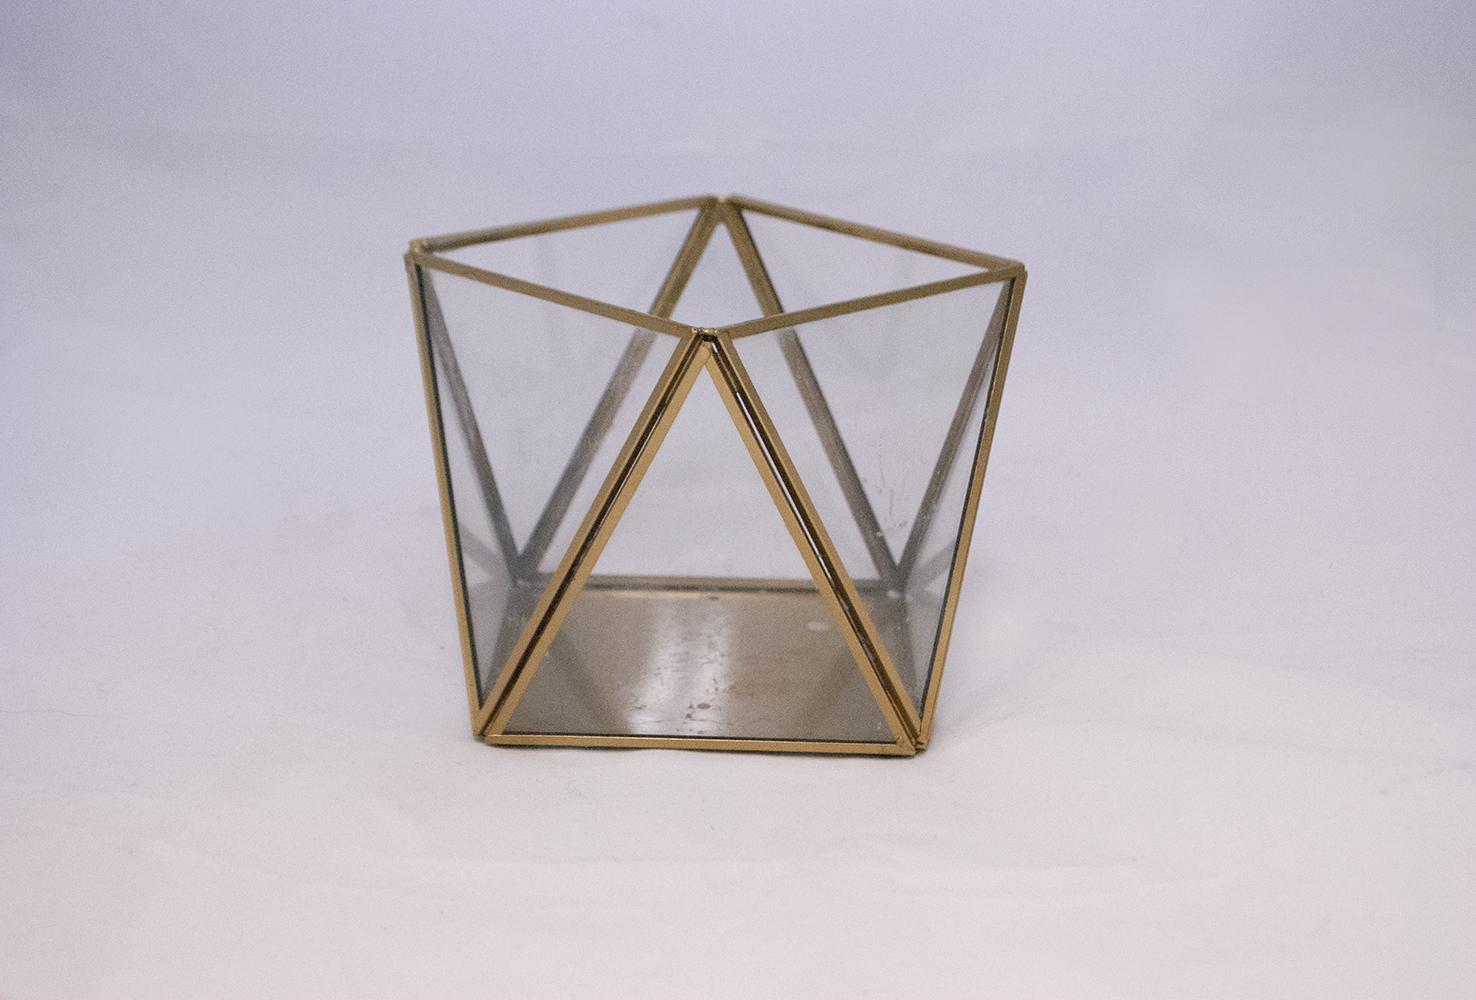 gold lotus Lantern   gold glass geometric  Quantity: 1  Price: $15.00